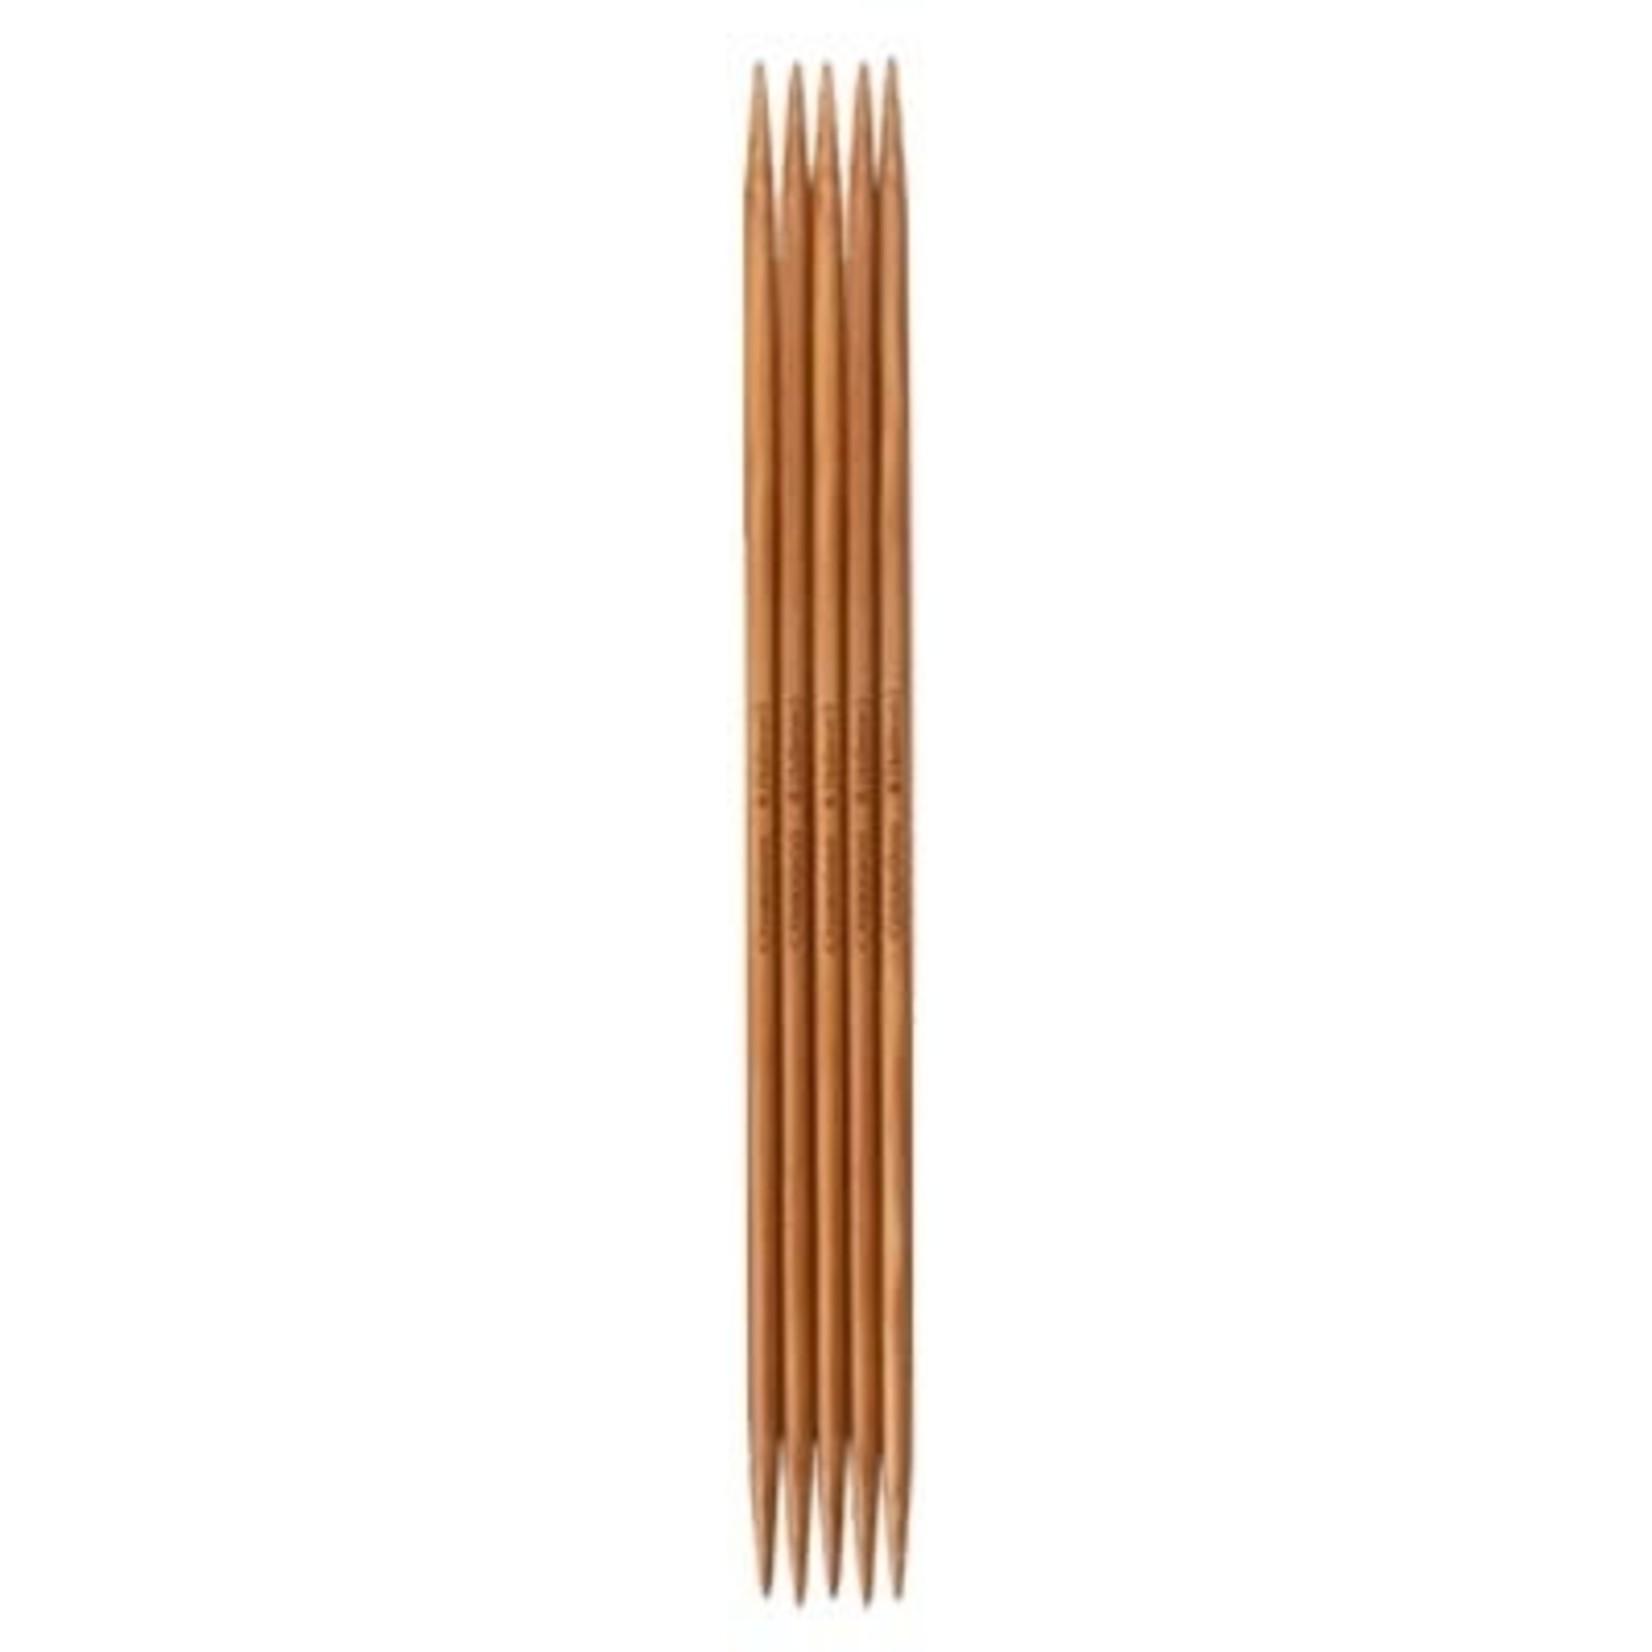 "ChiaoGoo Chiaogoo Patina Bamboo 6"" DPN's"